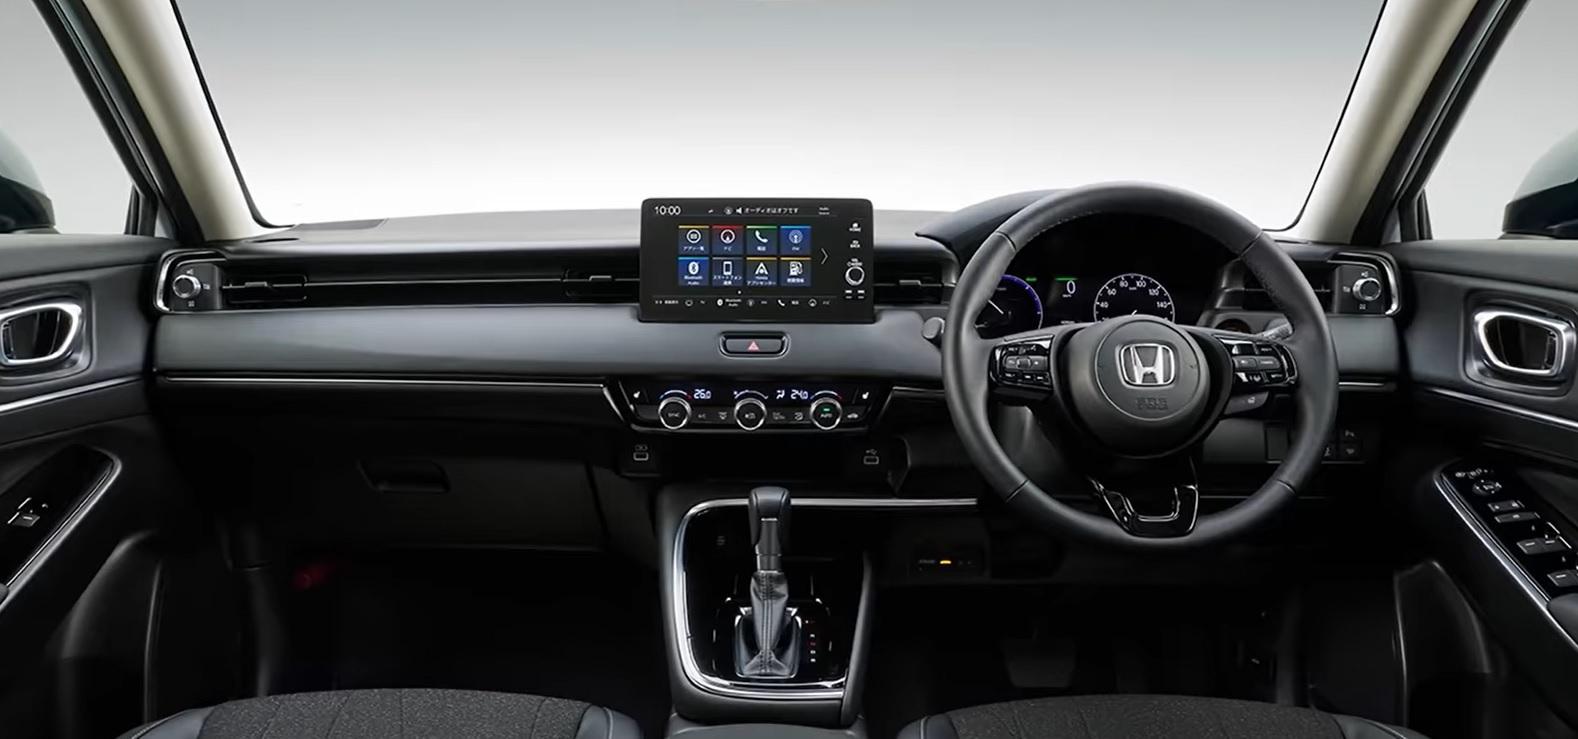 Honda HR-V thế hệ mới